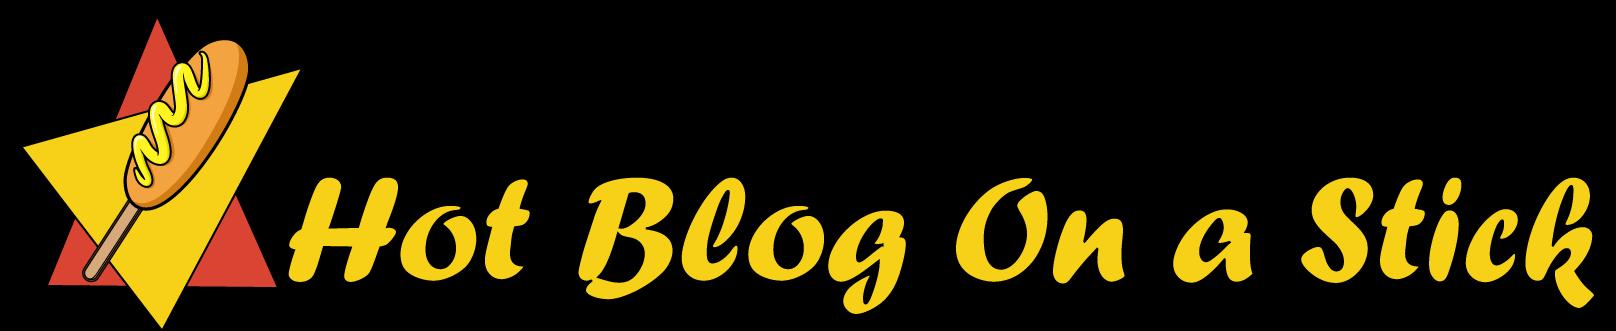 Hot Blog On A Stick